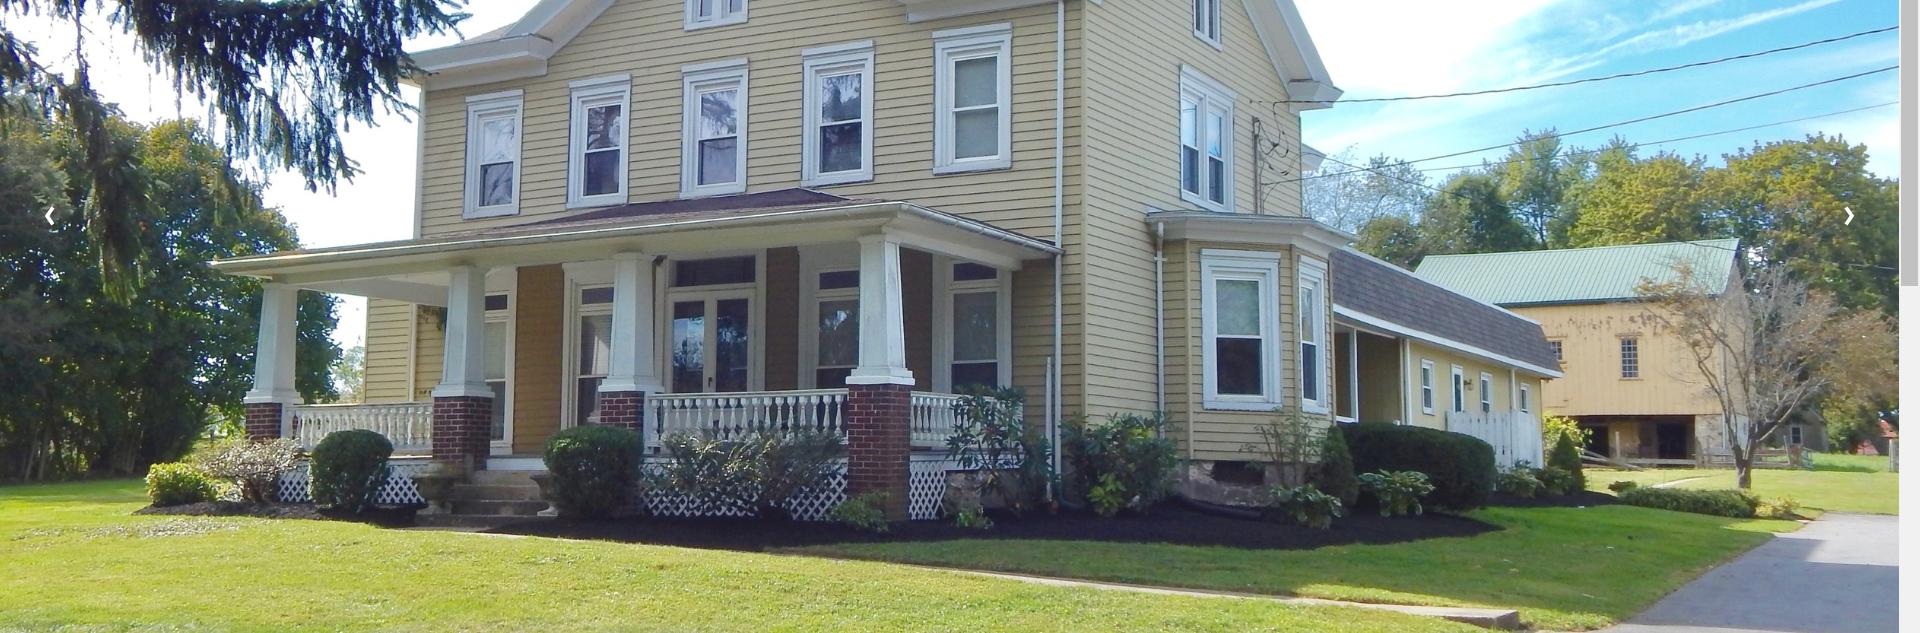 BridgeWay House Inc